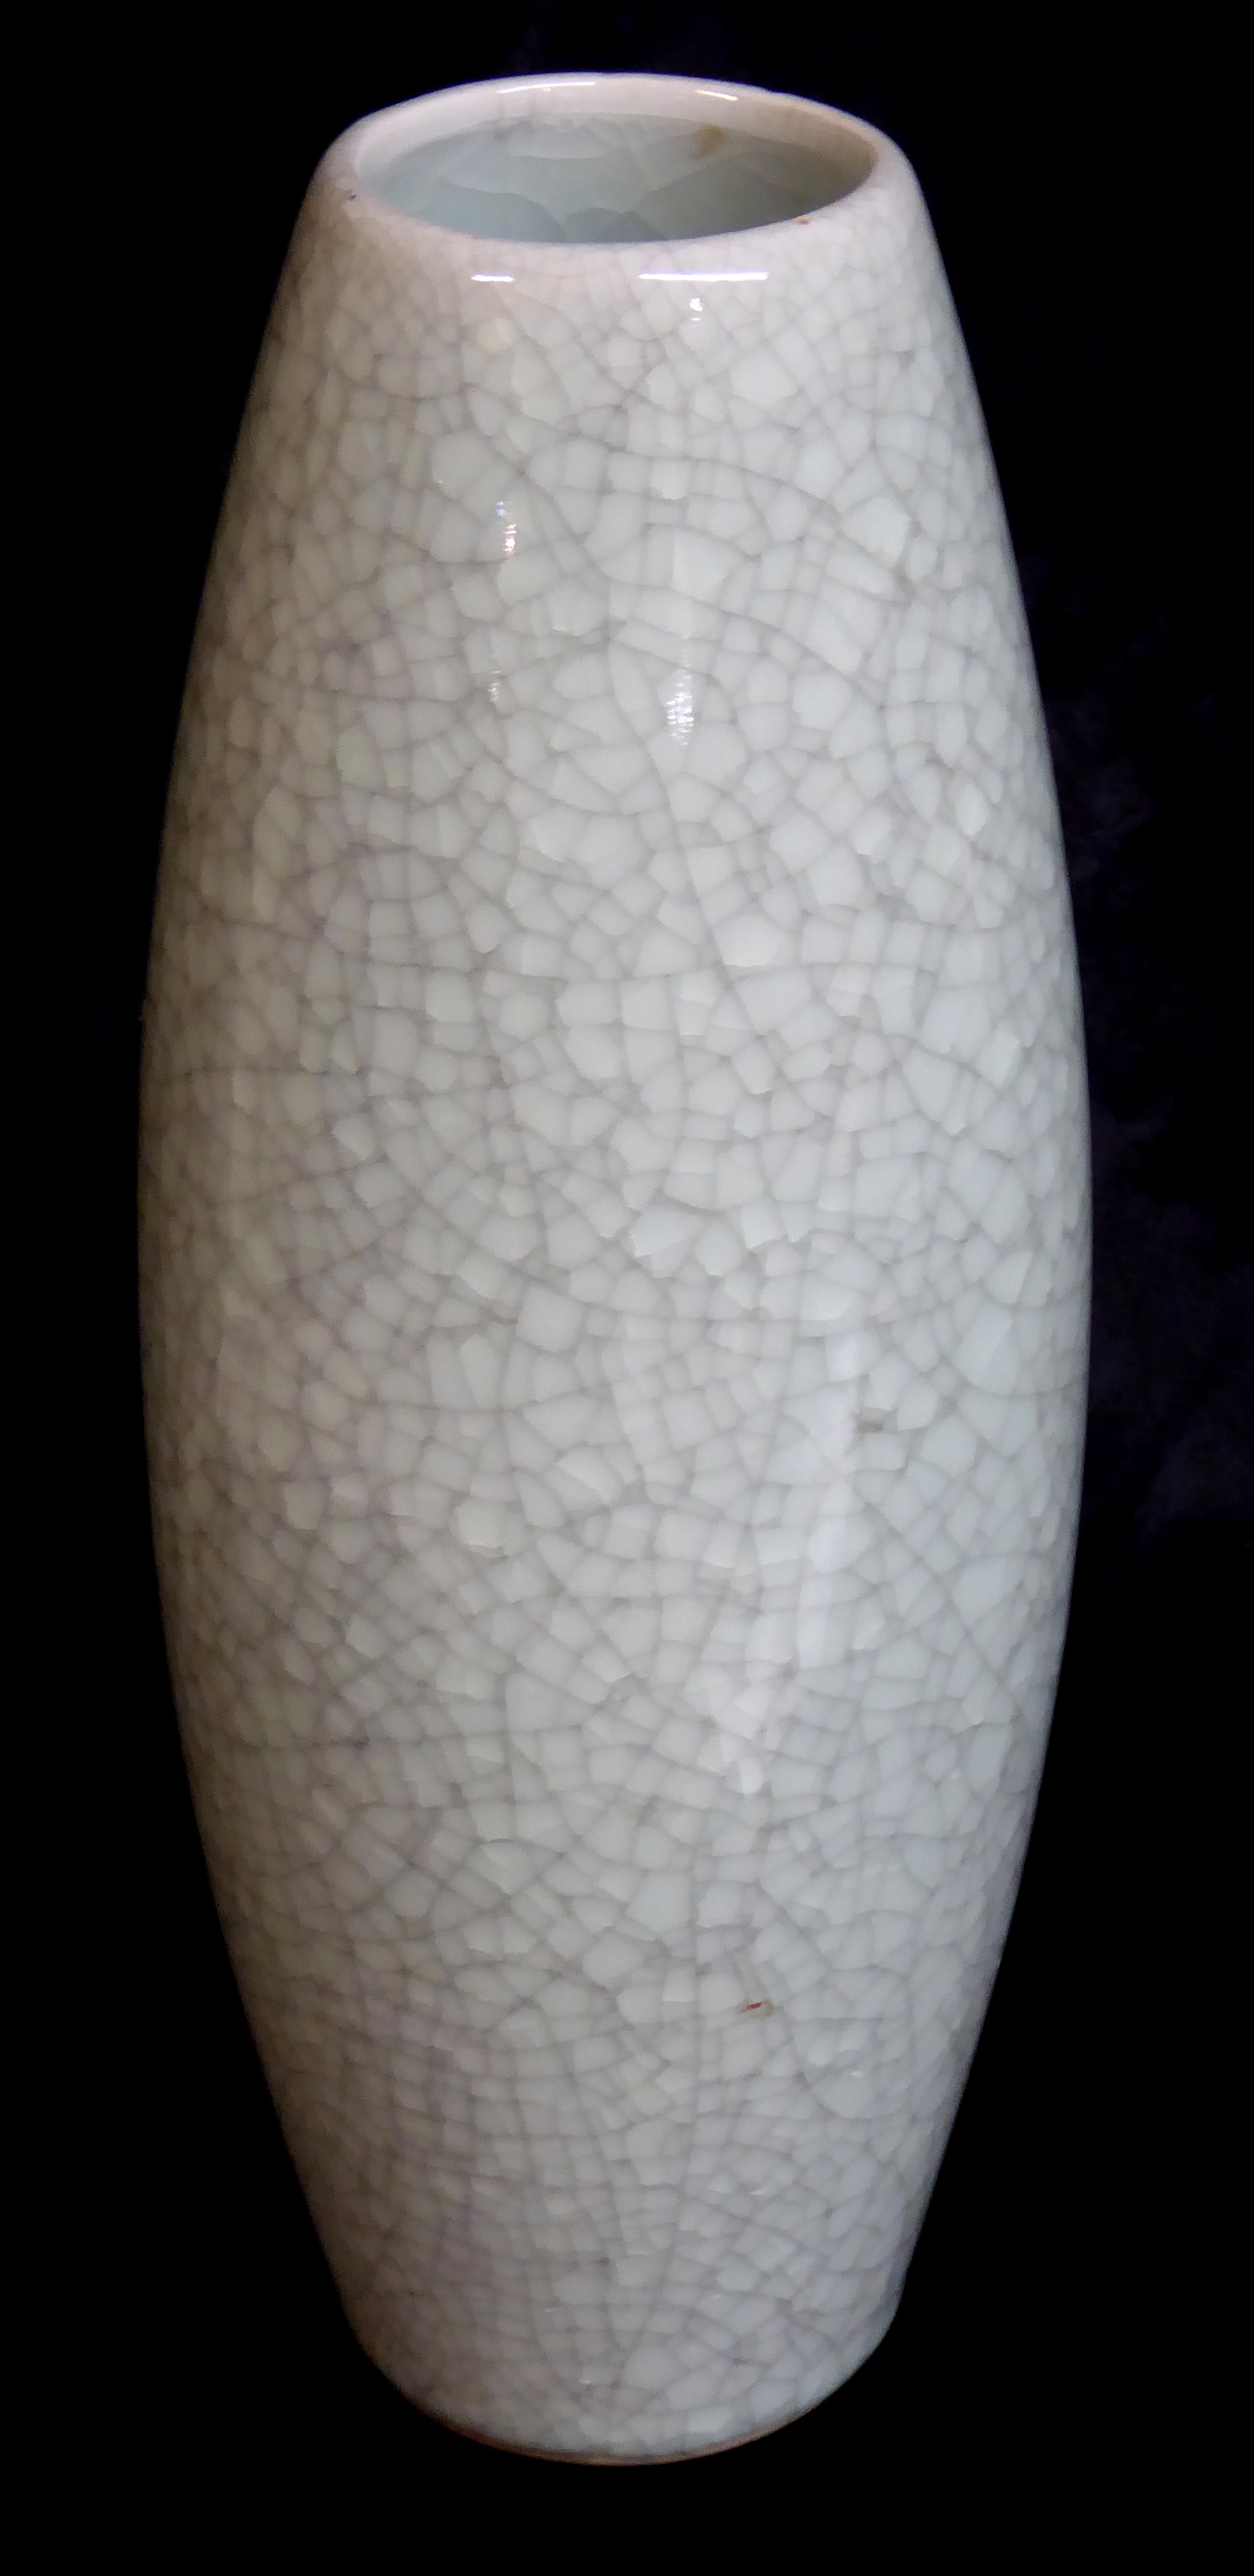 Lot 160 - A CHINESE CELADON CRACKLE GLAZE VASE Ovoid form of plain design Approx 30cm